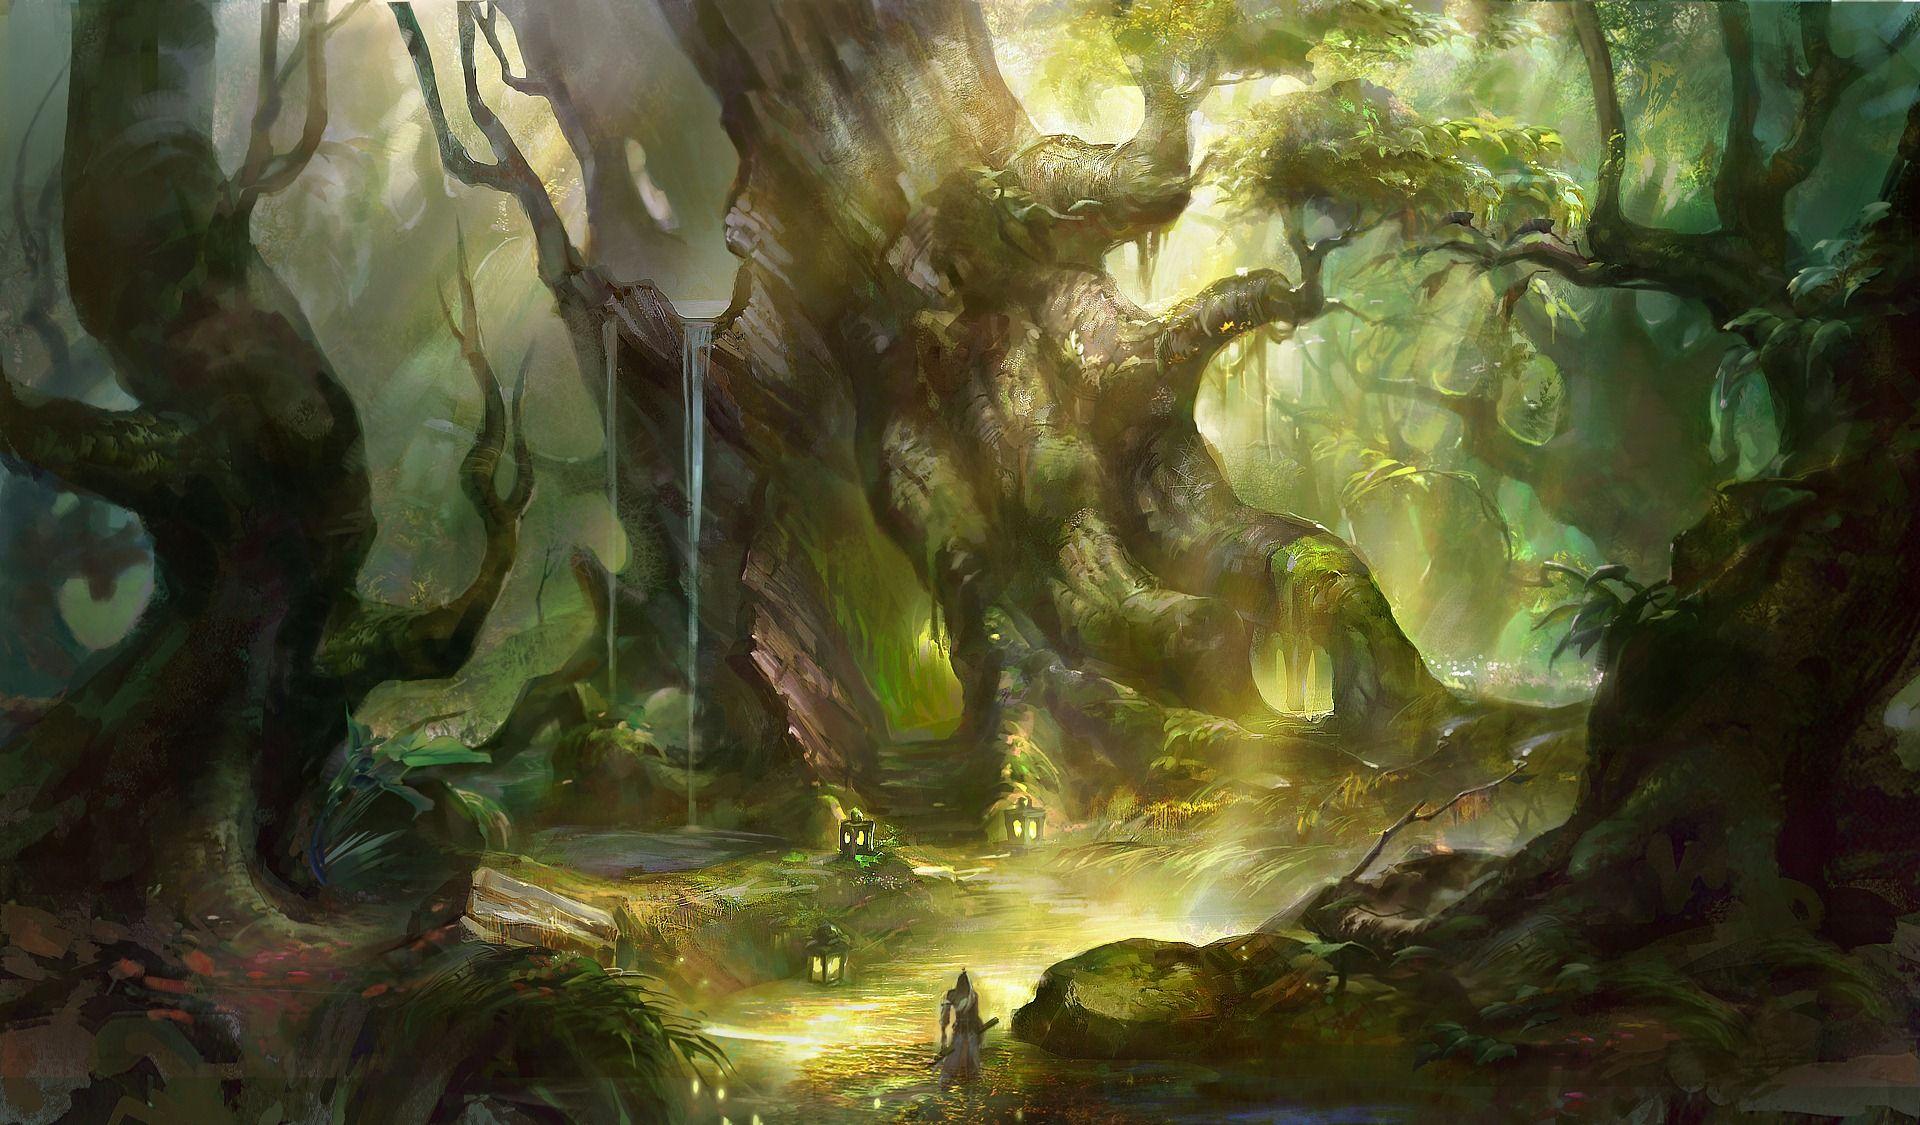 Fantasy Forest Wallpapers Fantasy Forest Forest Wallpaper Deviantart Fantasy